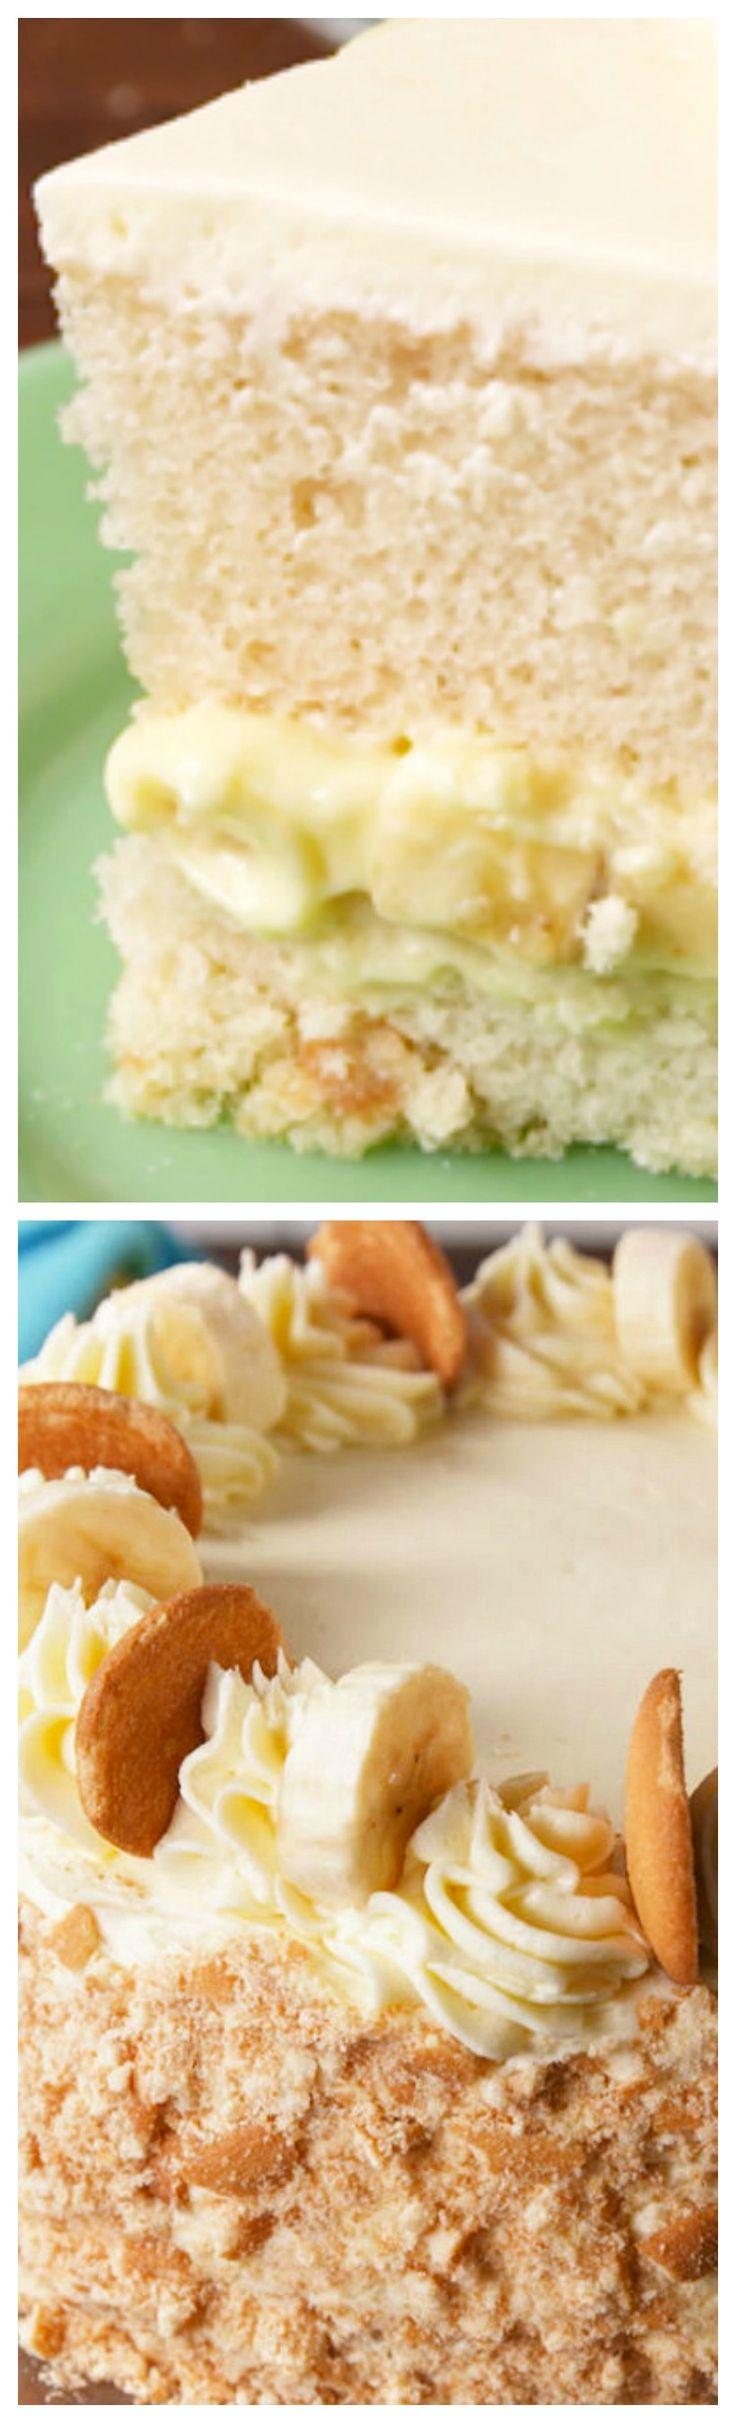 4069 Best Best Yummy Desserts And Homemade Goodies